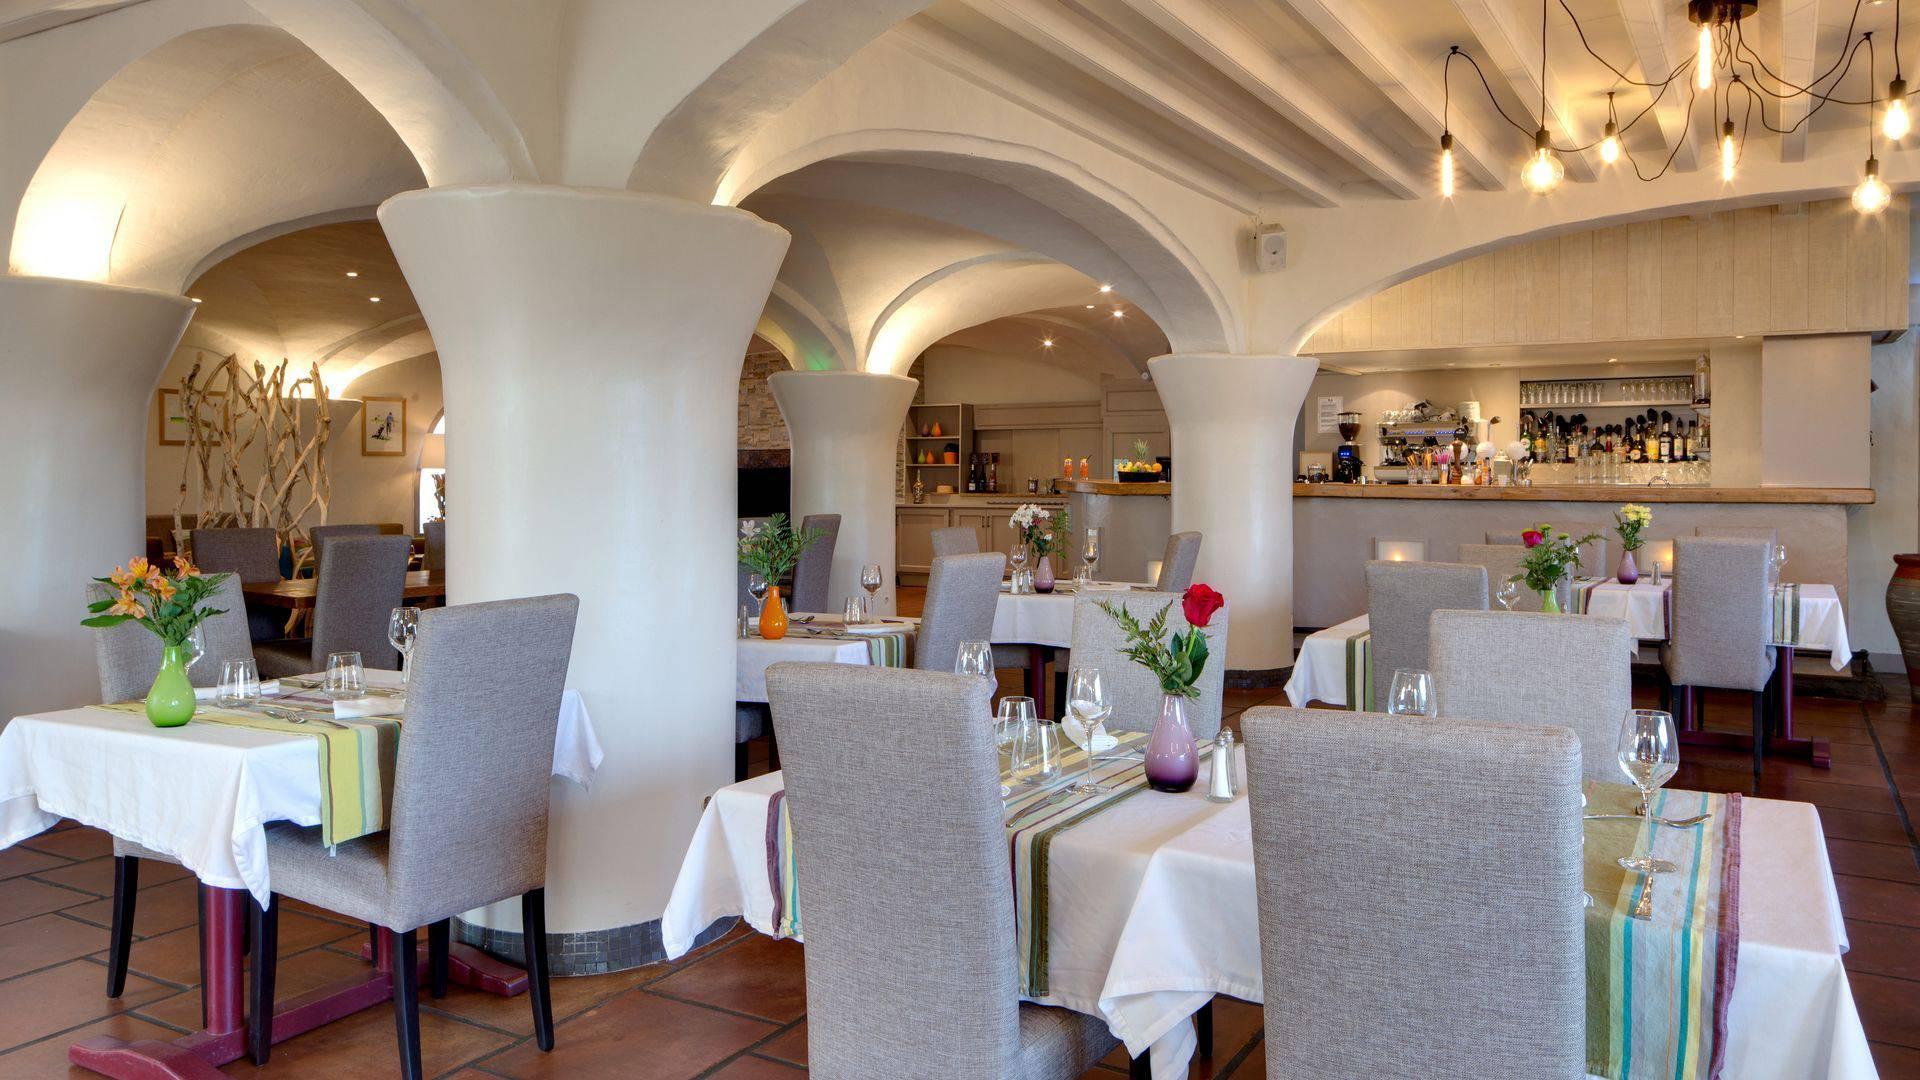 Le-Domaine-de-Falgos-Golf-Spa-occitanie-restaurant-seminaires-de-caractere